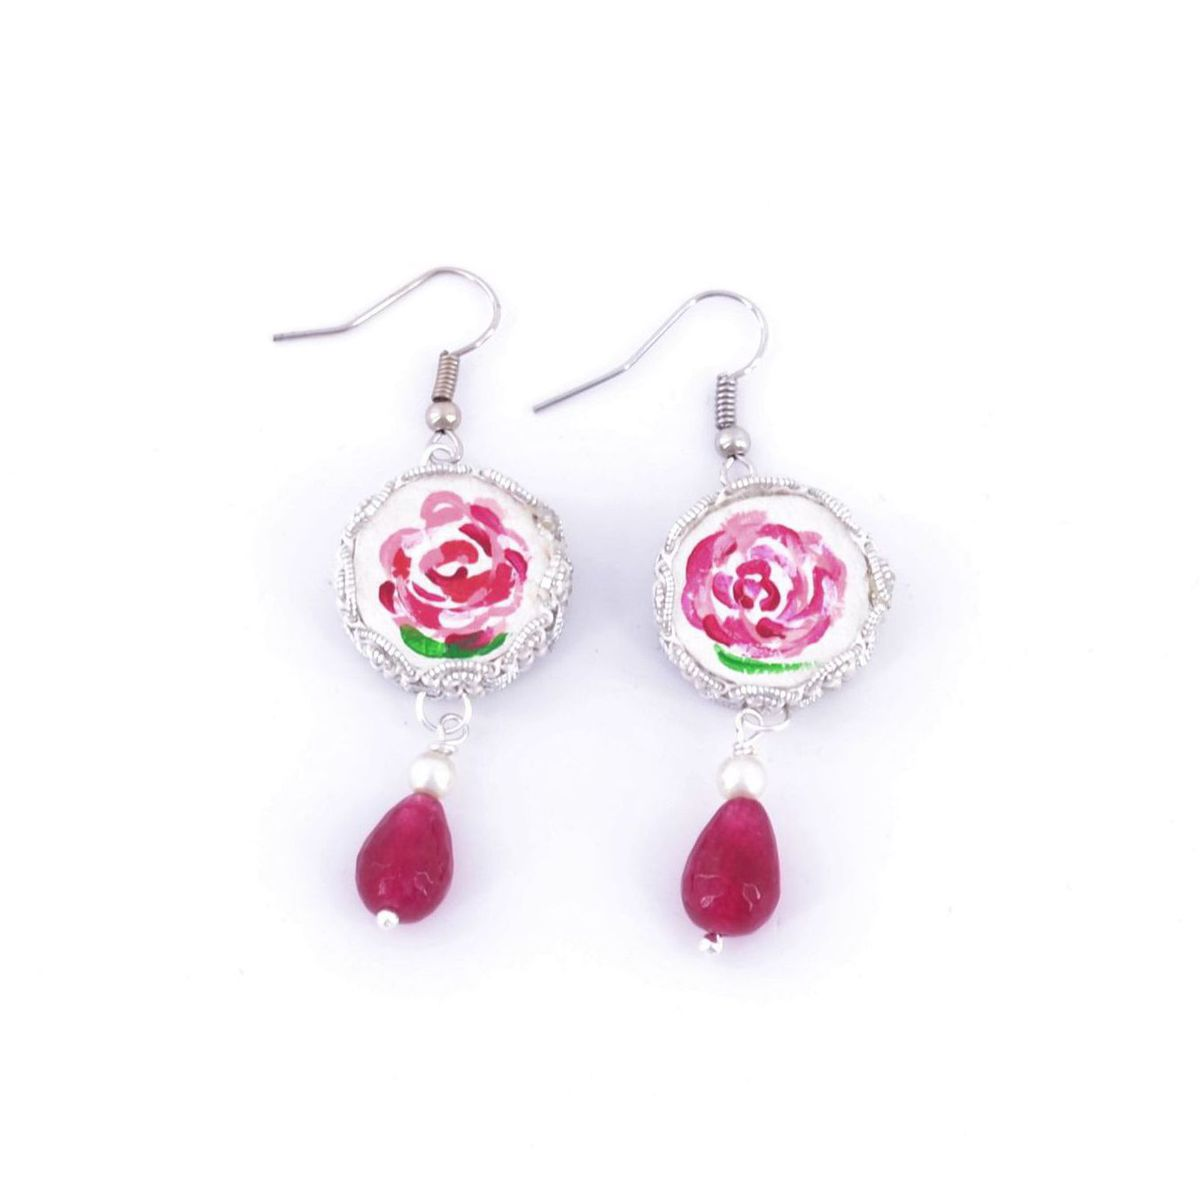 Tambourine Rose Mamma Earrings Red BRASS Gioielli